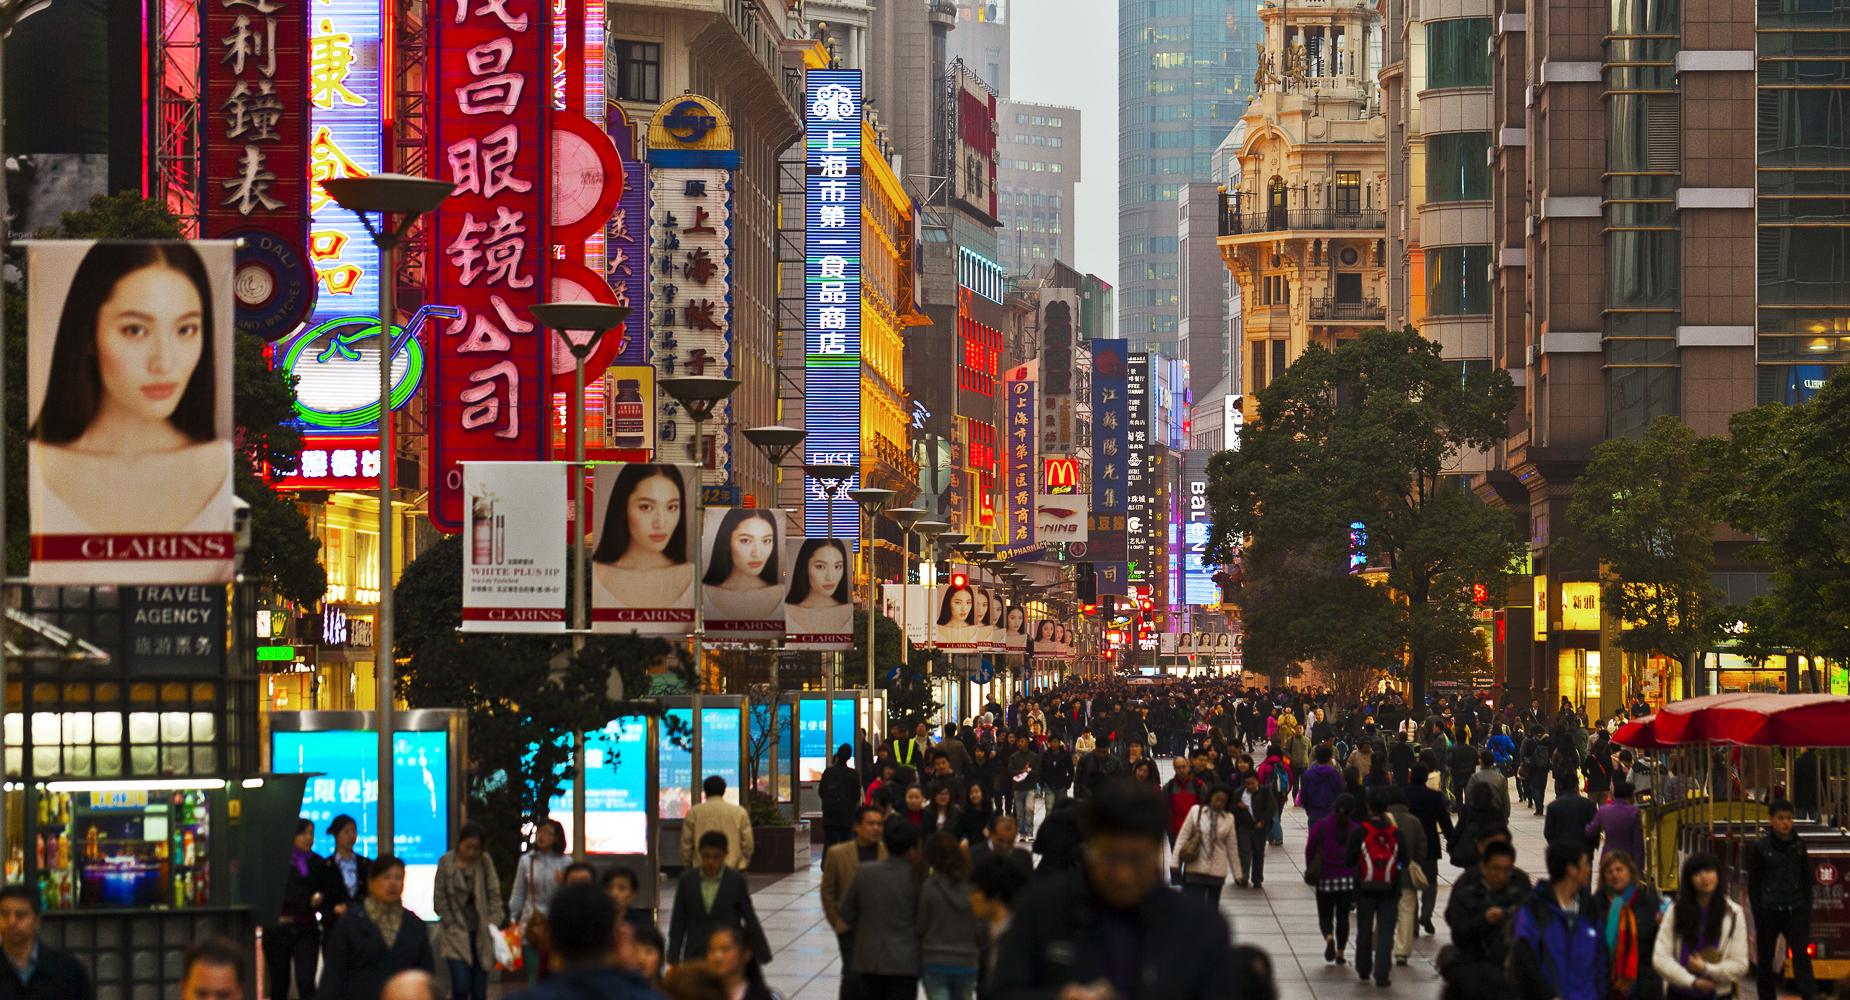 Shanghai Nanjing Road Shopping Pedestrian Street